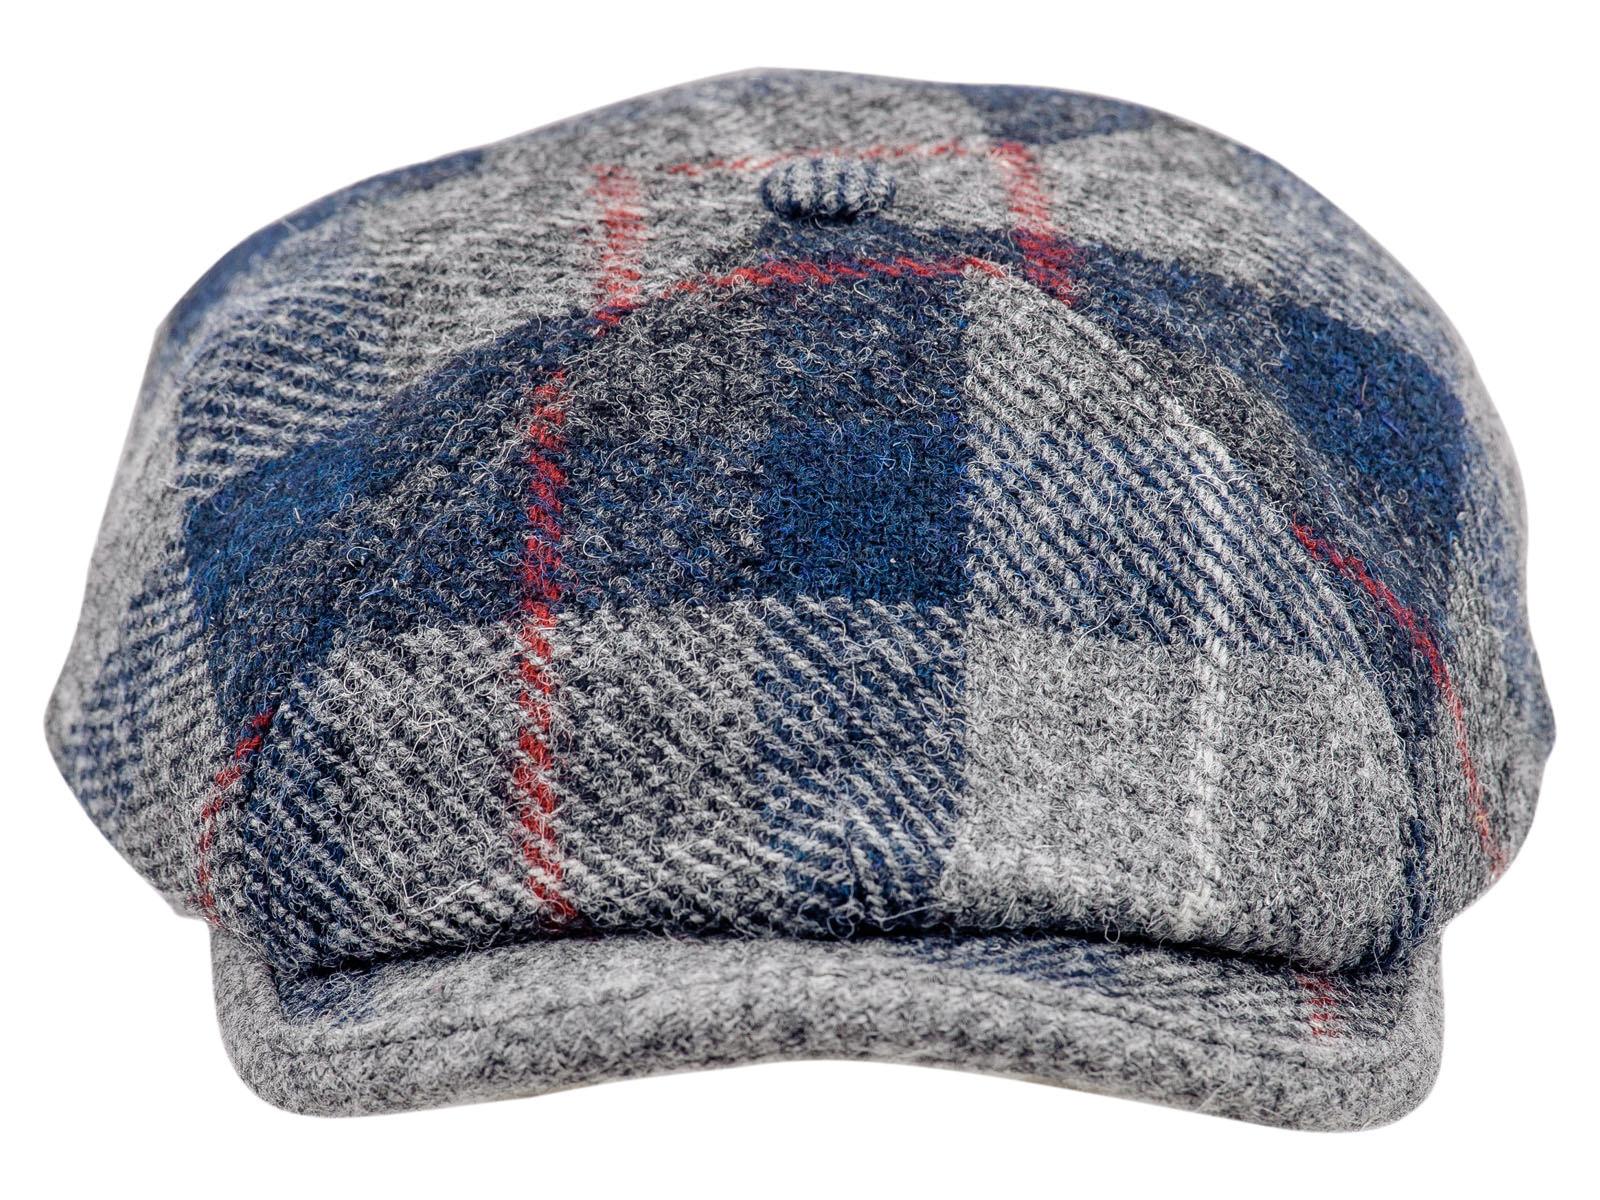 77afe521eb226 Docker longshoreman beanie Leon cap made of 100% pure emerizing ...